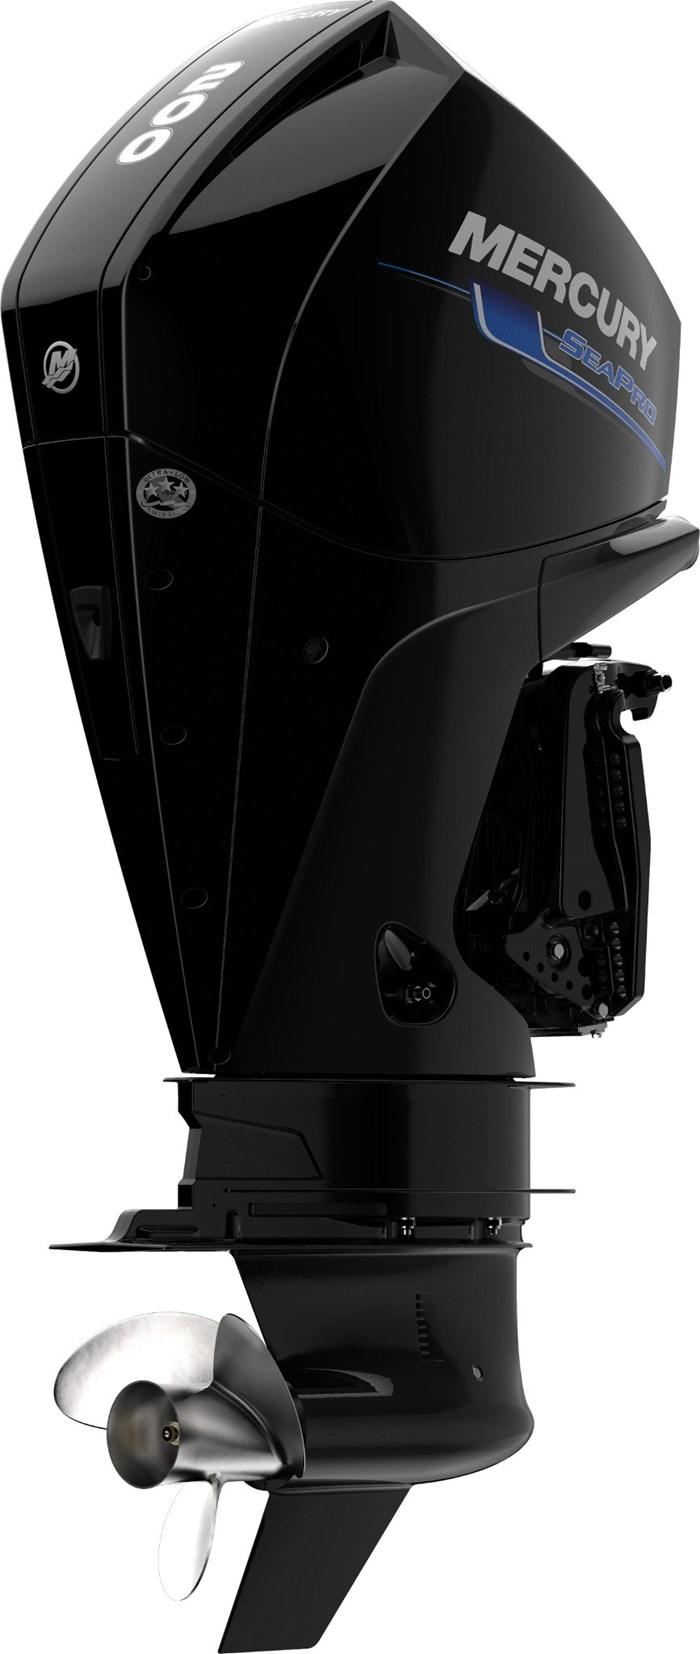 2021 Mercury 200CXL V-6 4-Stroke SeaPro Commercial Outboard Photo 5 of 18